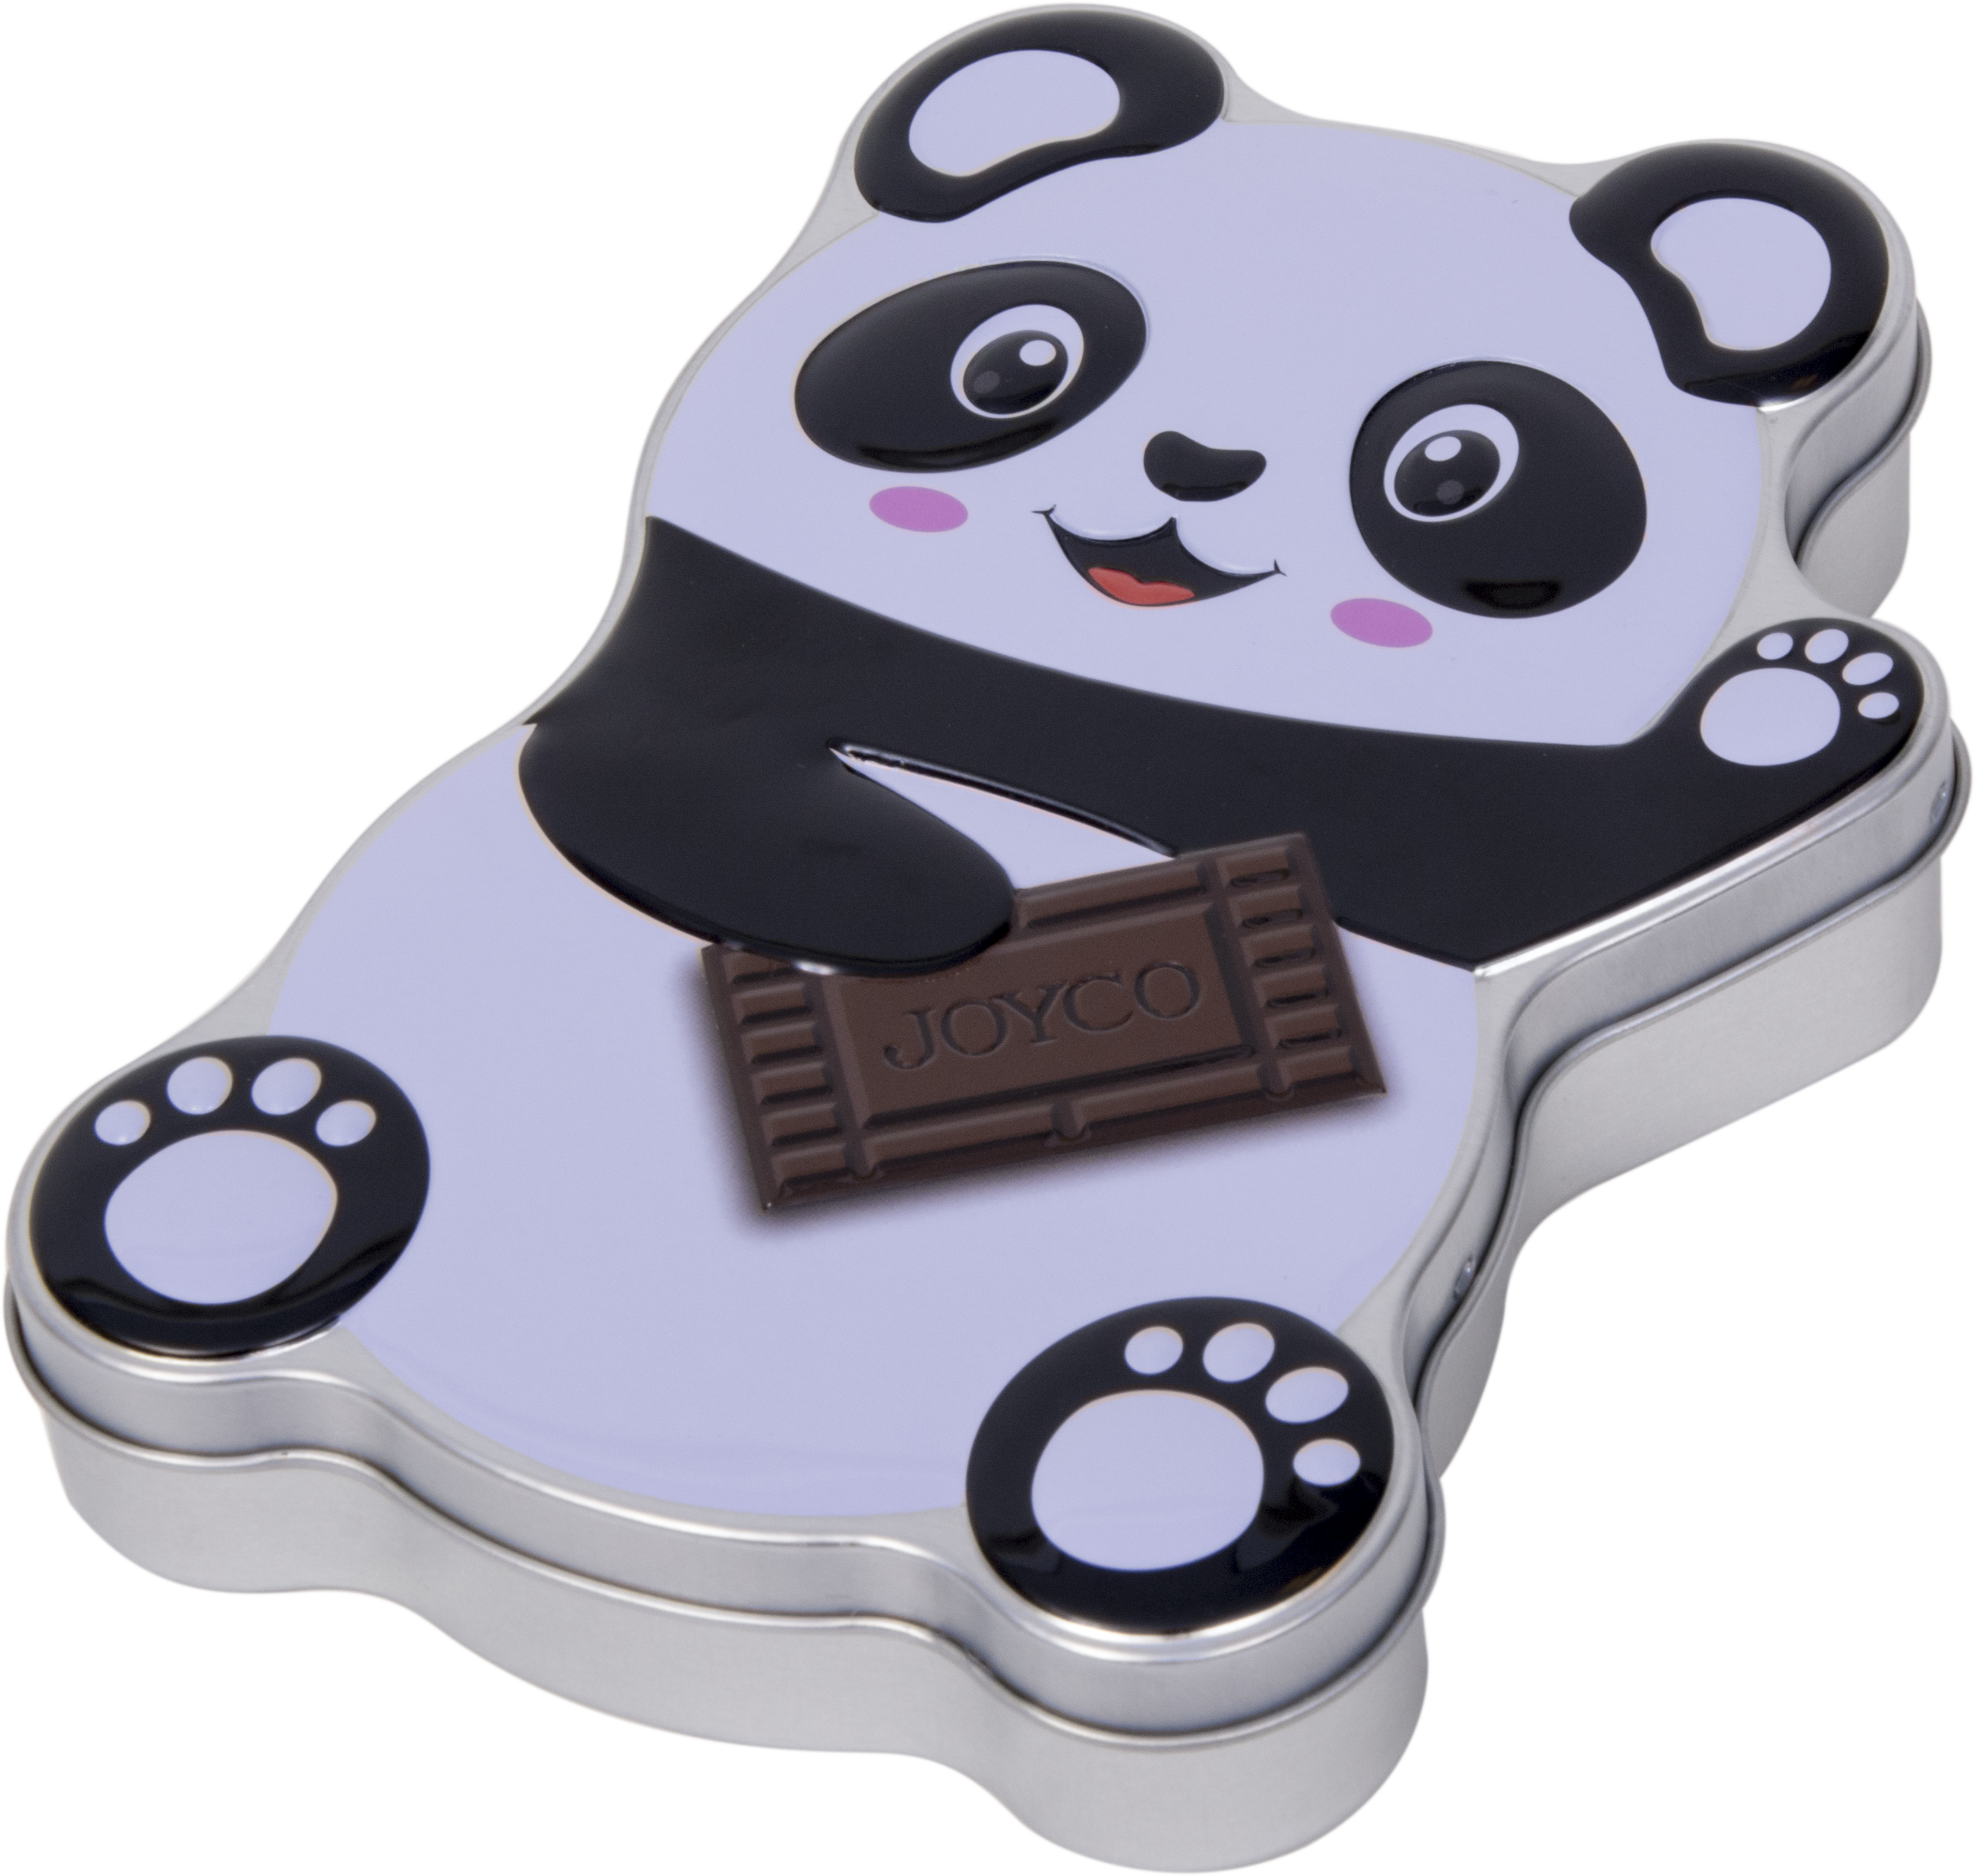 Werbe-Blechdosen: Panda Chocolate